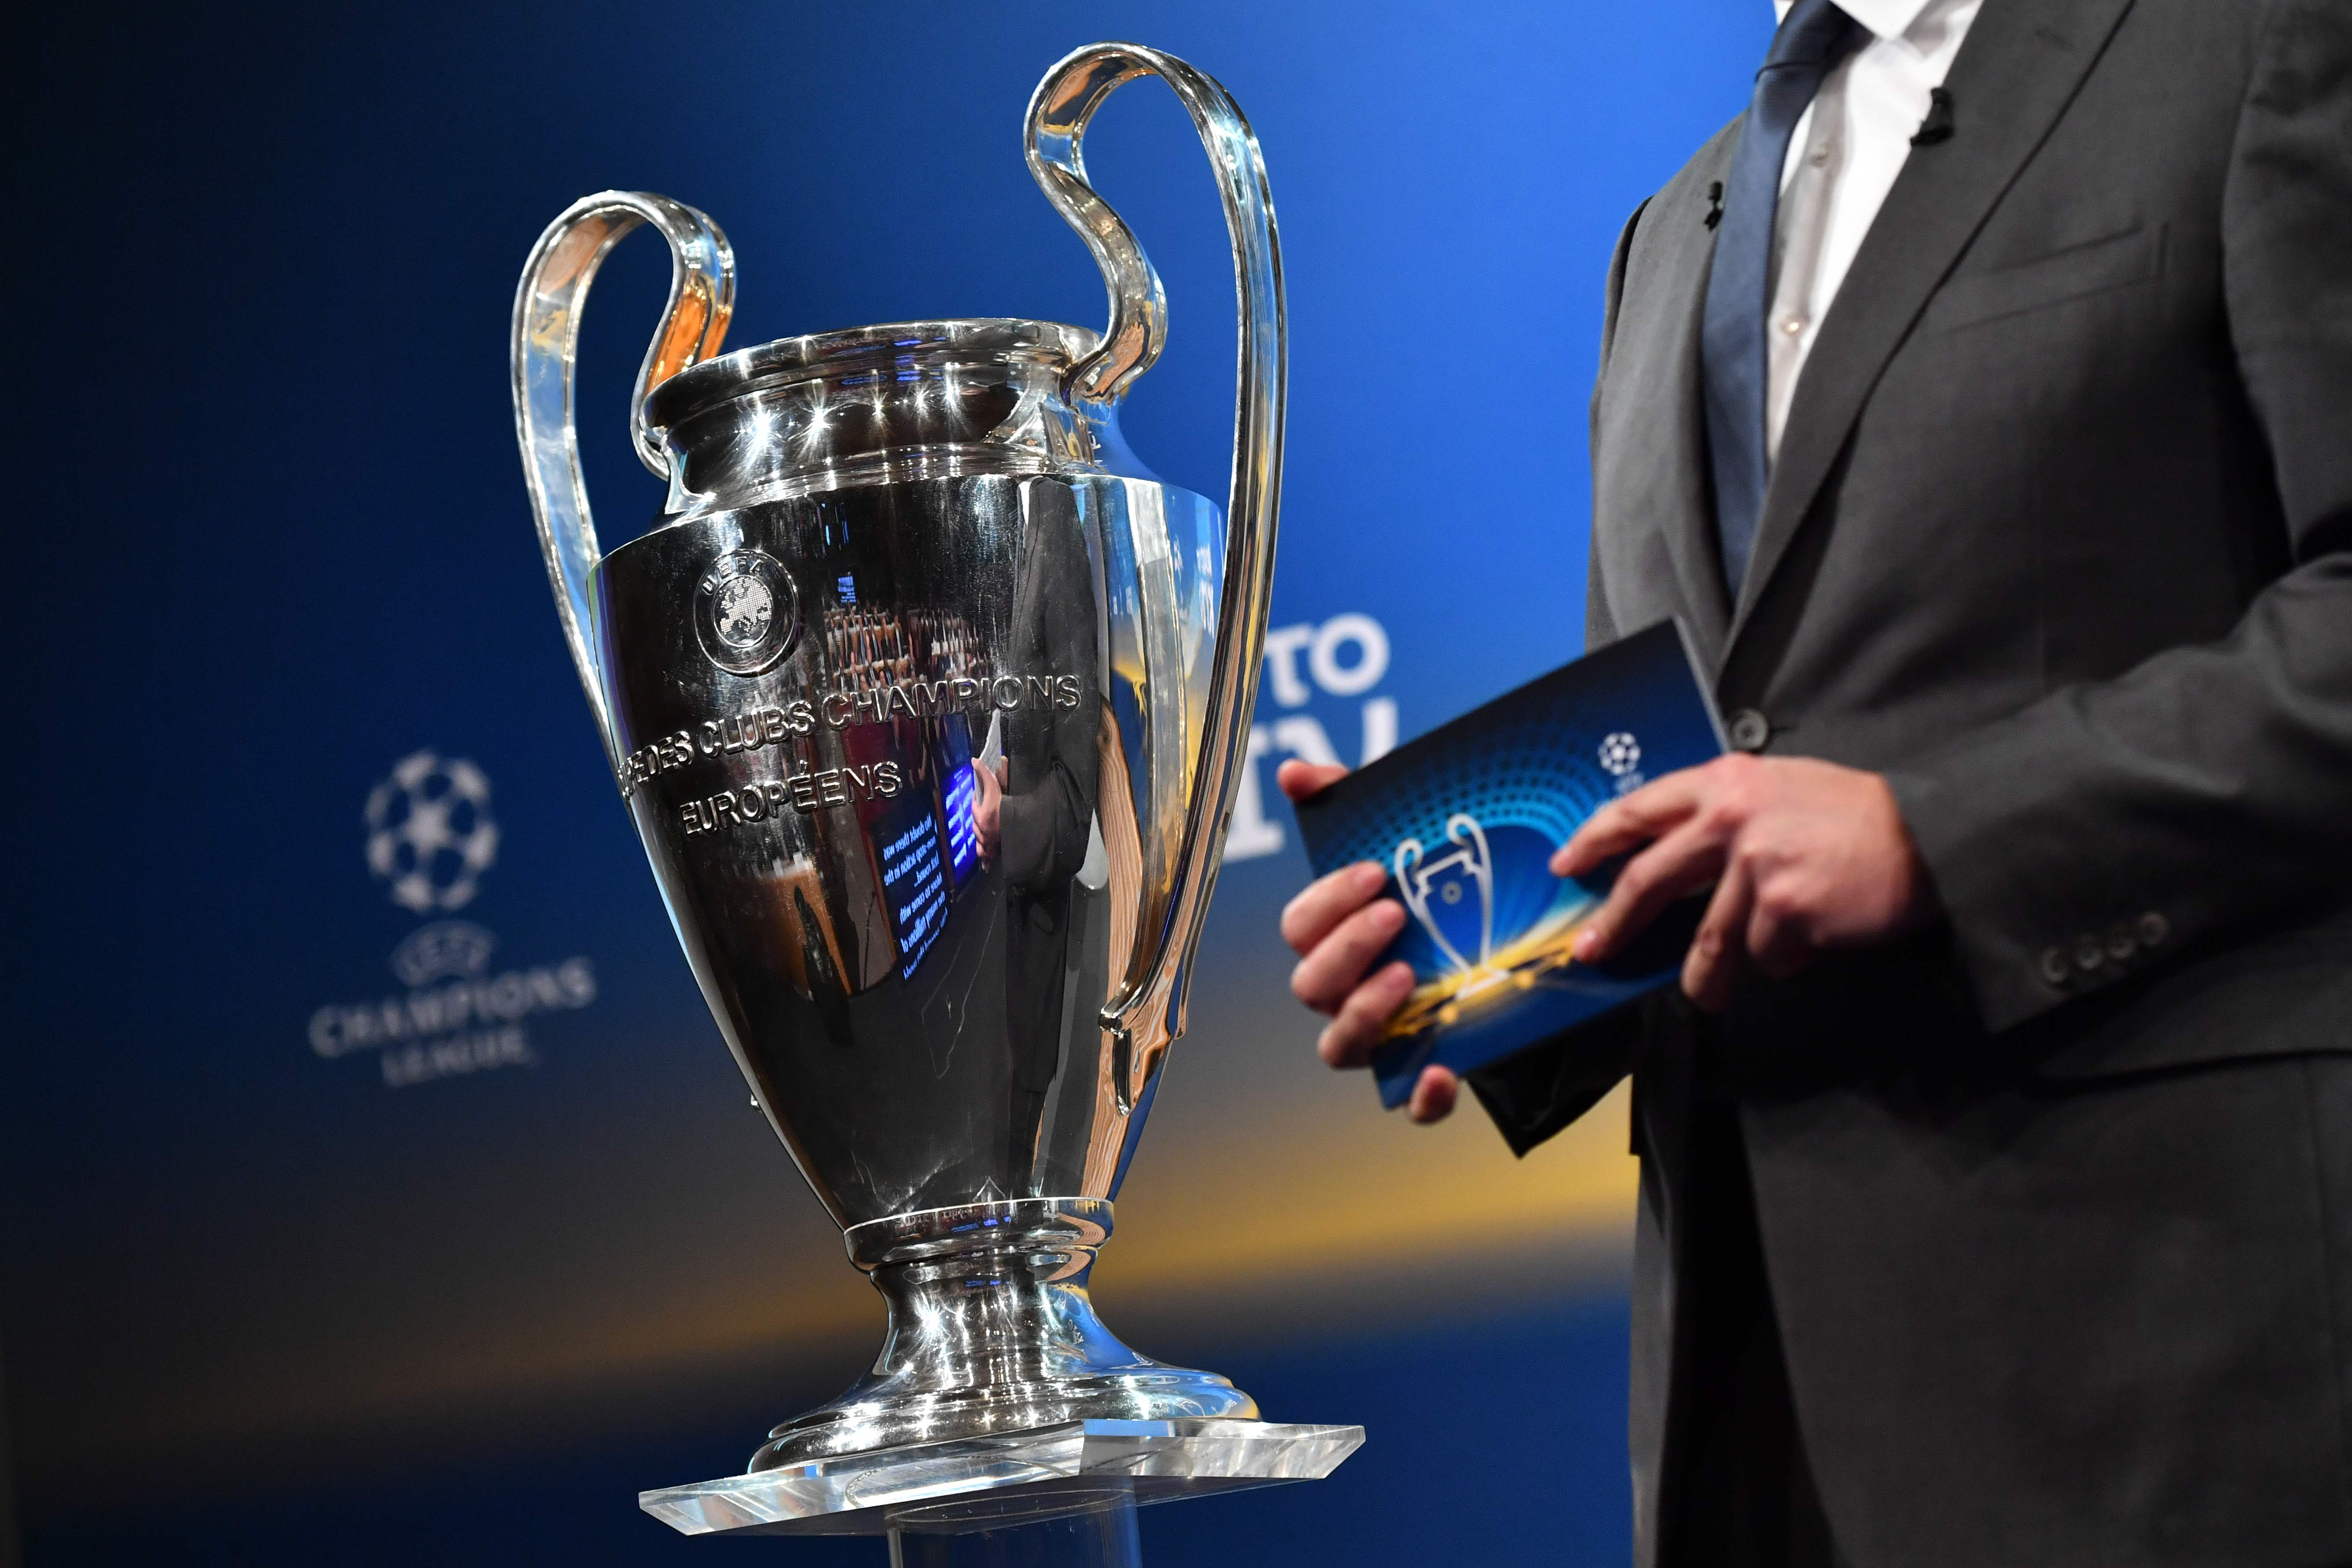 Real en Juventus op herhaling in kwartfinales CL, Liverpool treft City